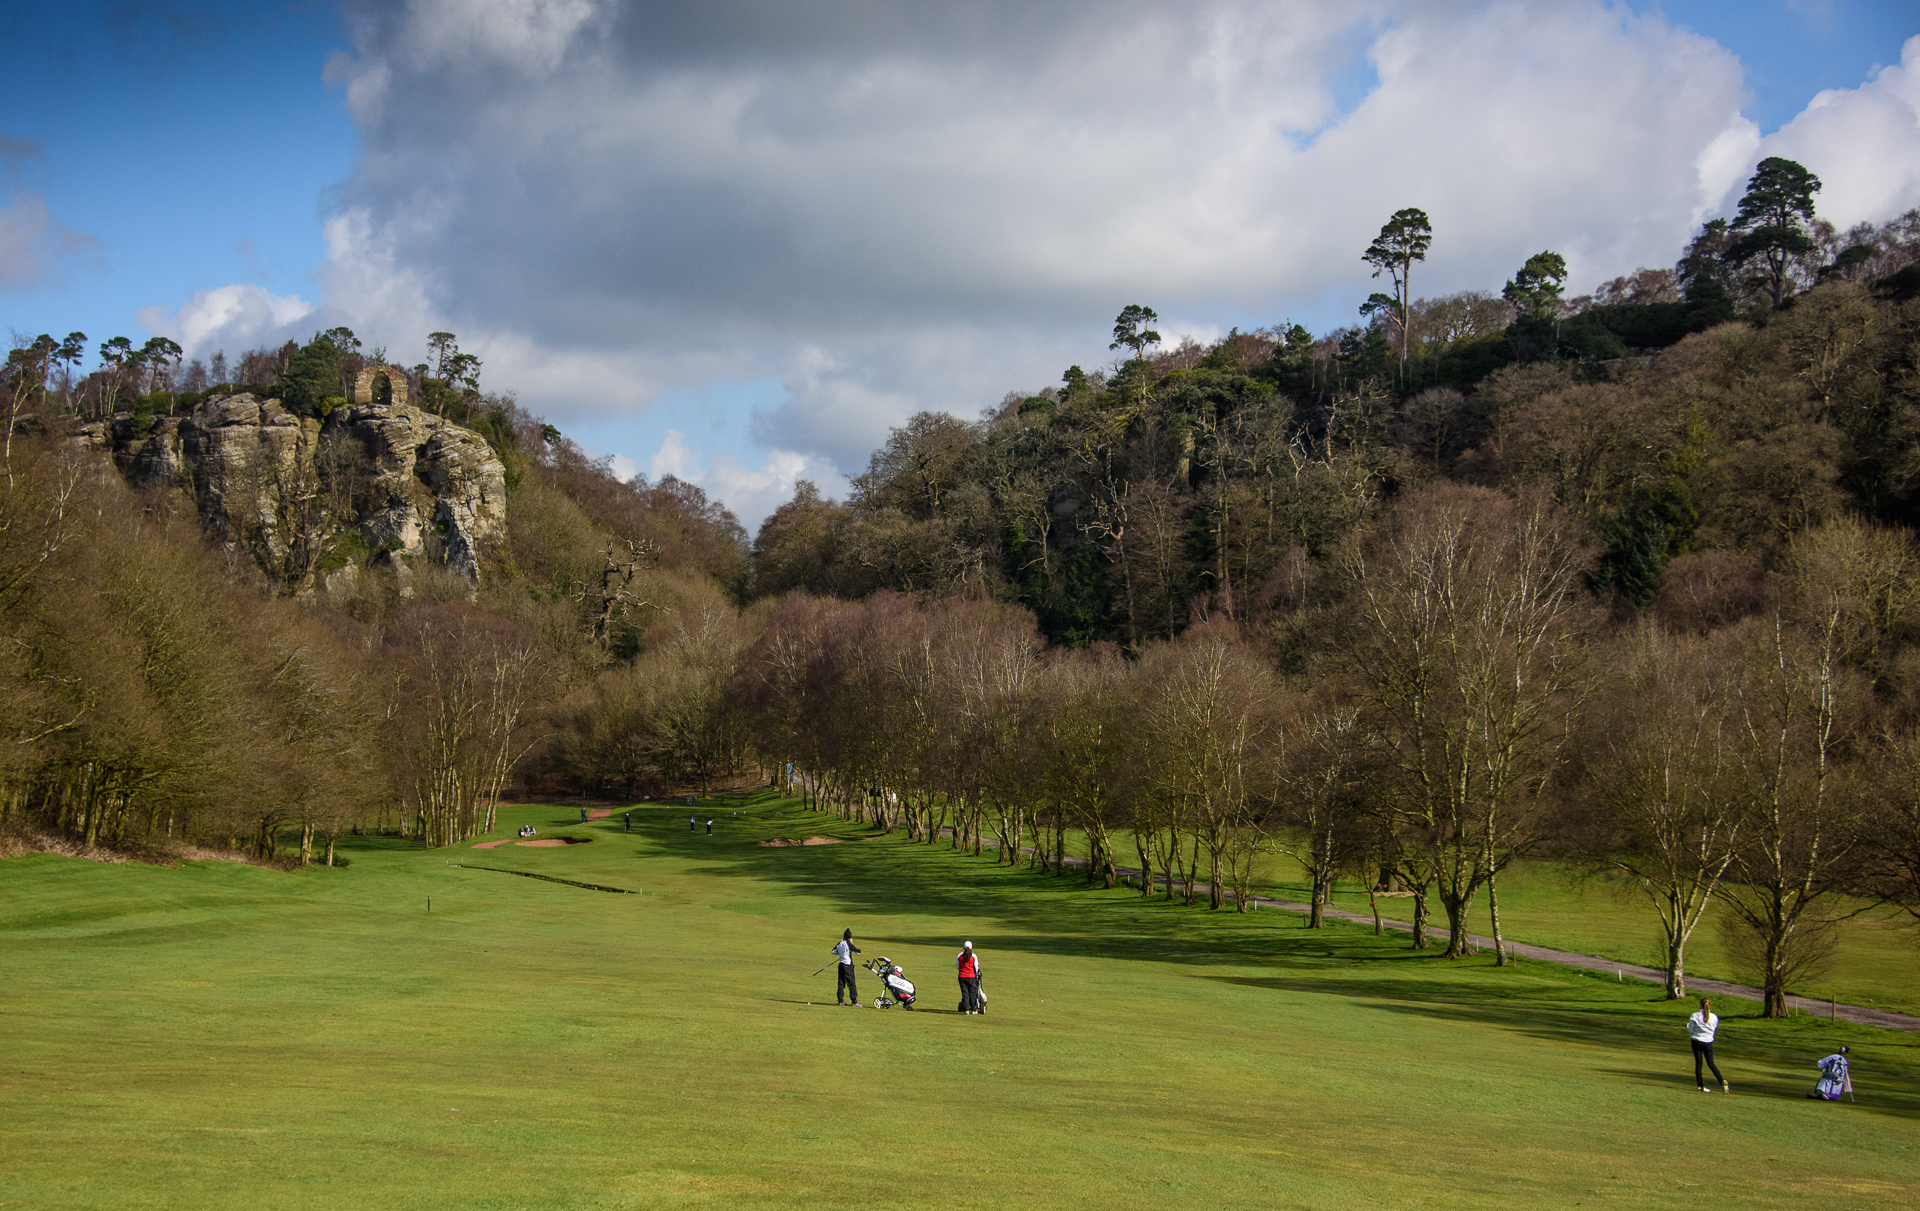 Kevindiss.com golf course photography Hawkstone Park golf course-2503-2.jpg